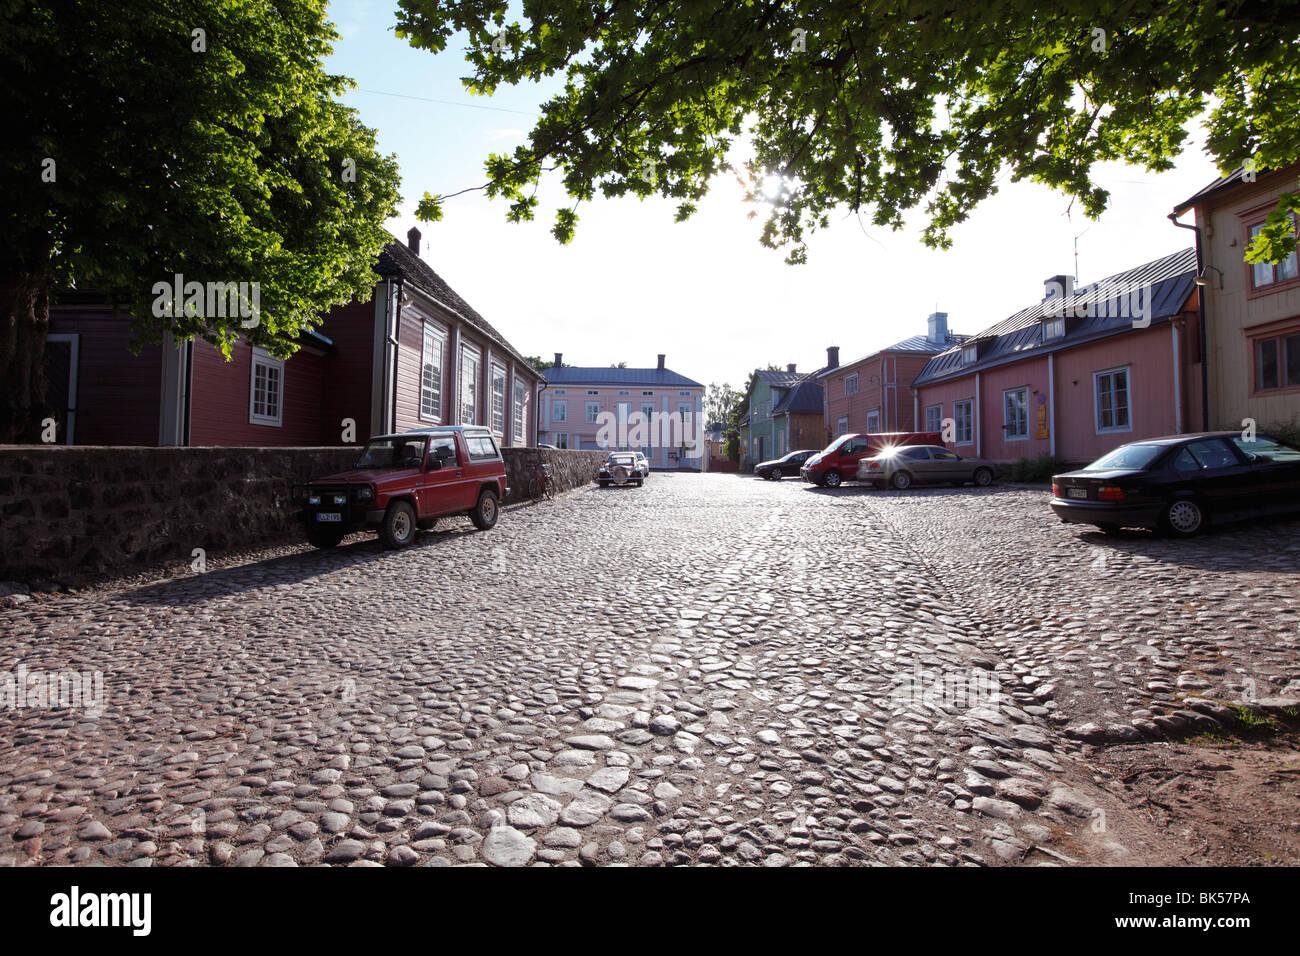 Cobblestone street, Old Town, Porvoo, Uusimaa, Finland, Scandinavia, Europe - Stock Image